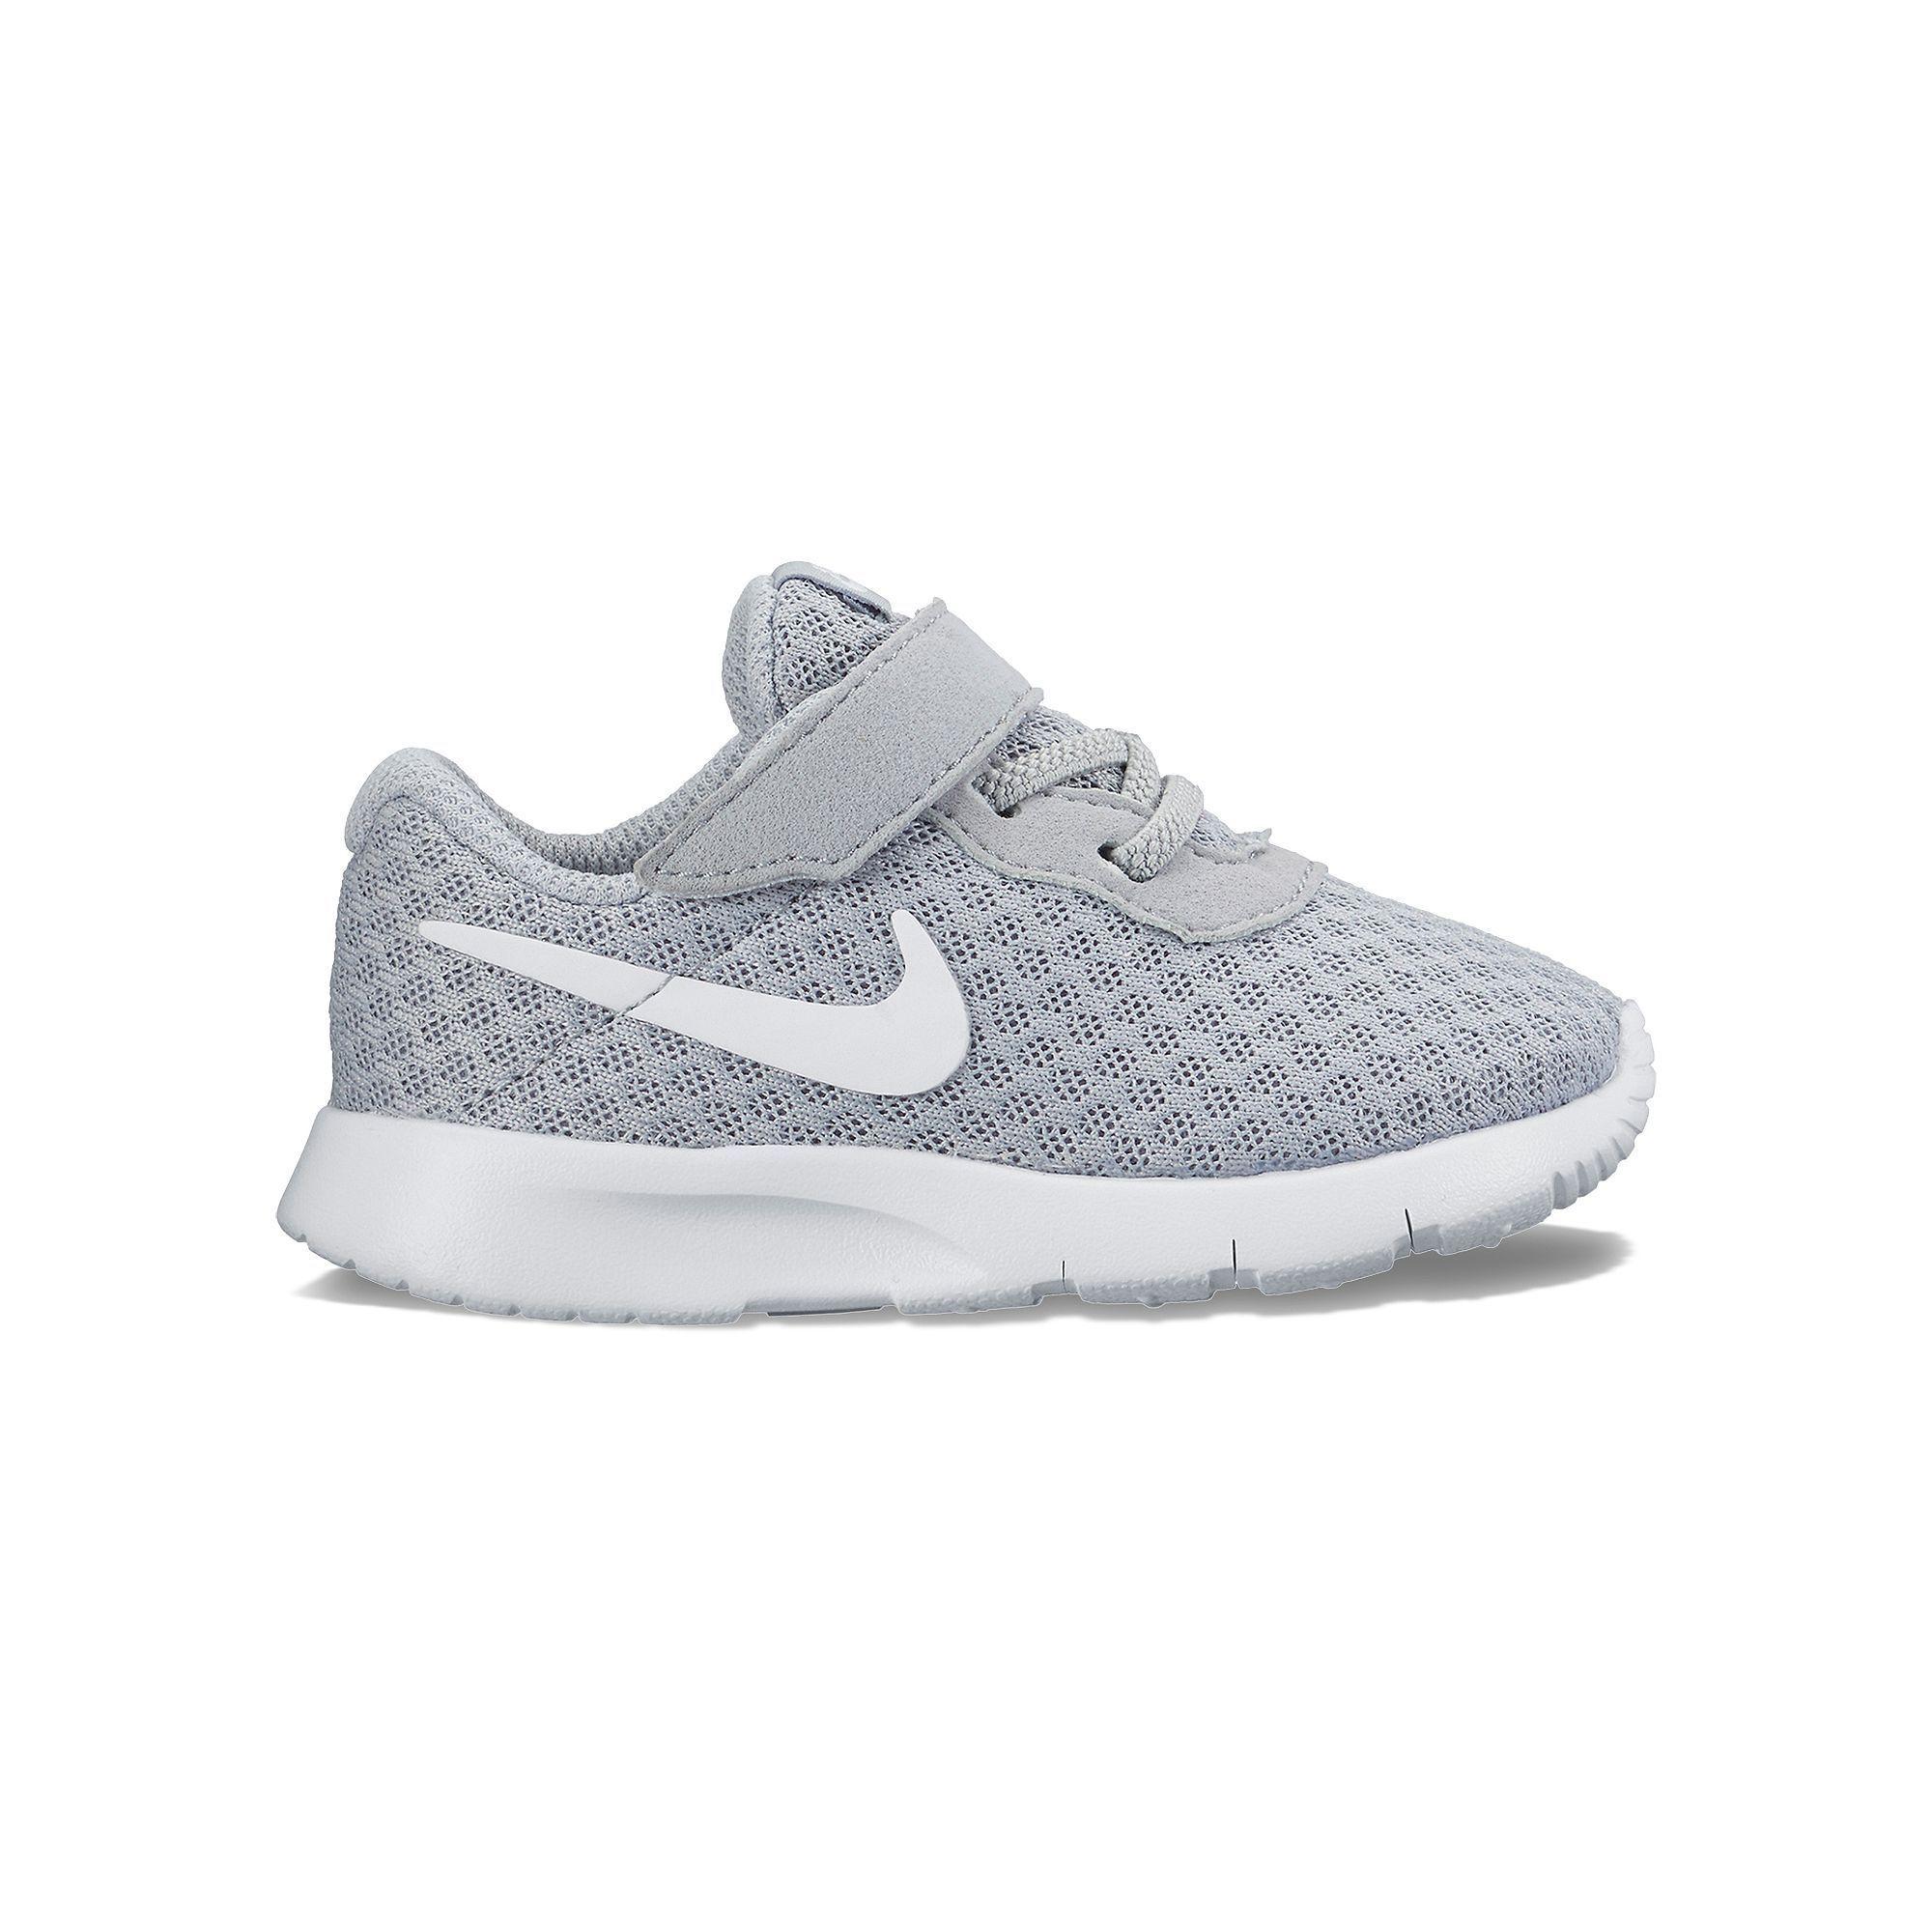 Nike Chaussures Garçon Bambin Taille 10 jeu abordable vue rabais zyqahqjOG6